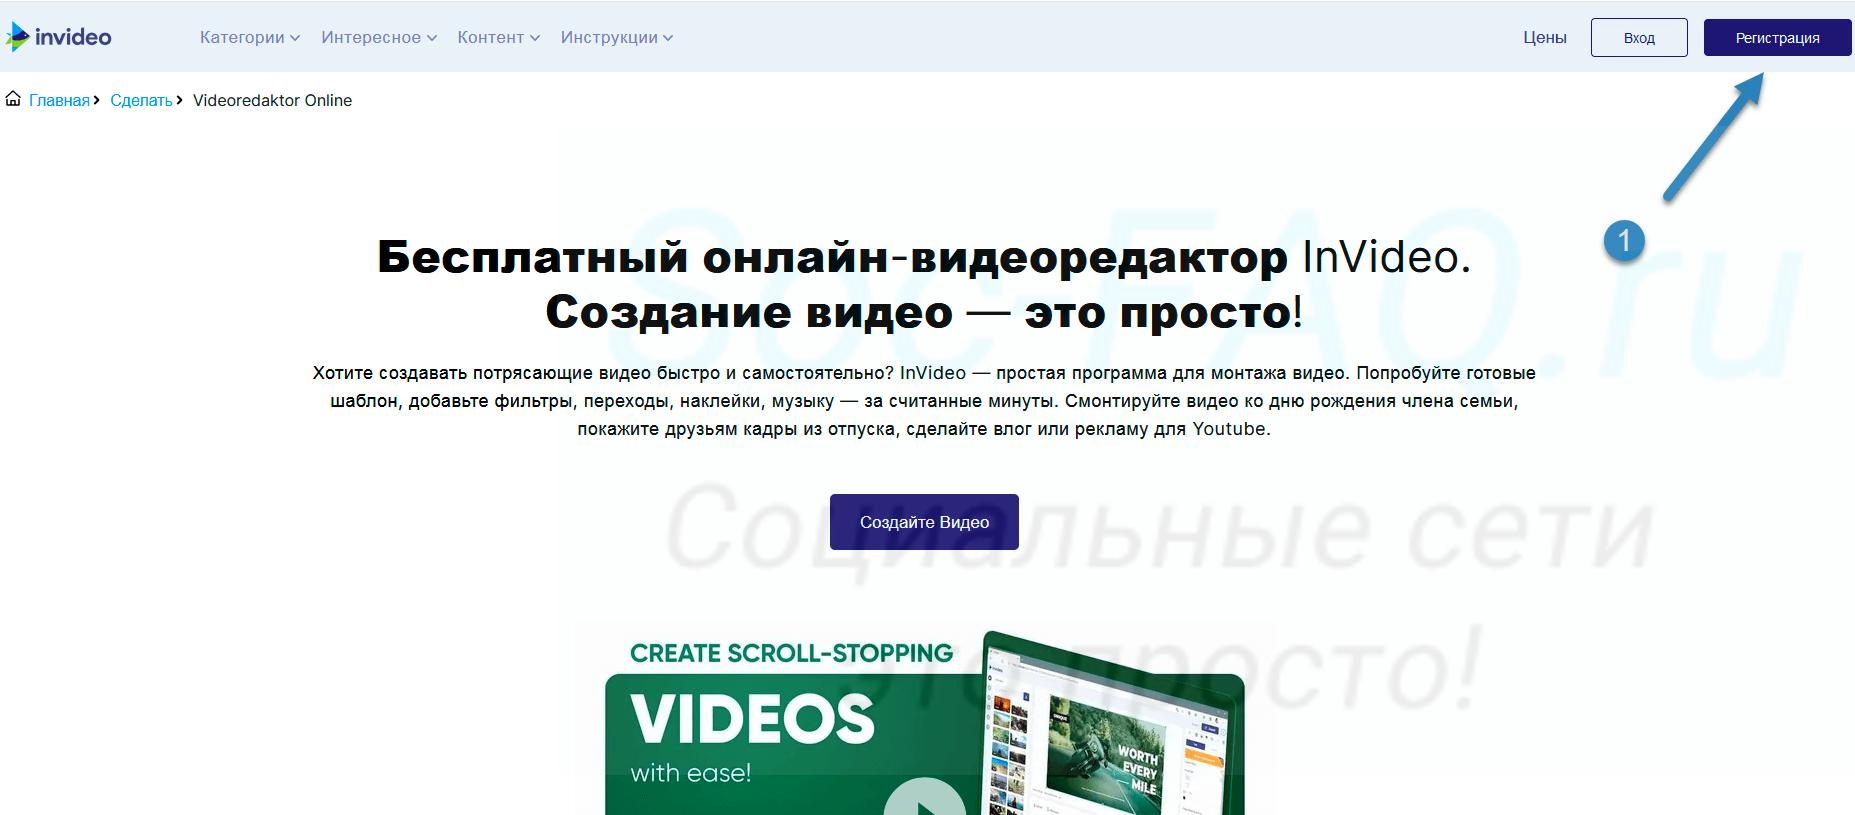 Регистрация в сервисе InVideo